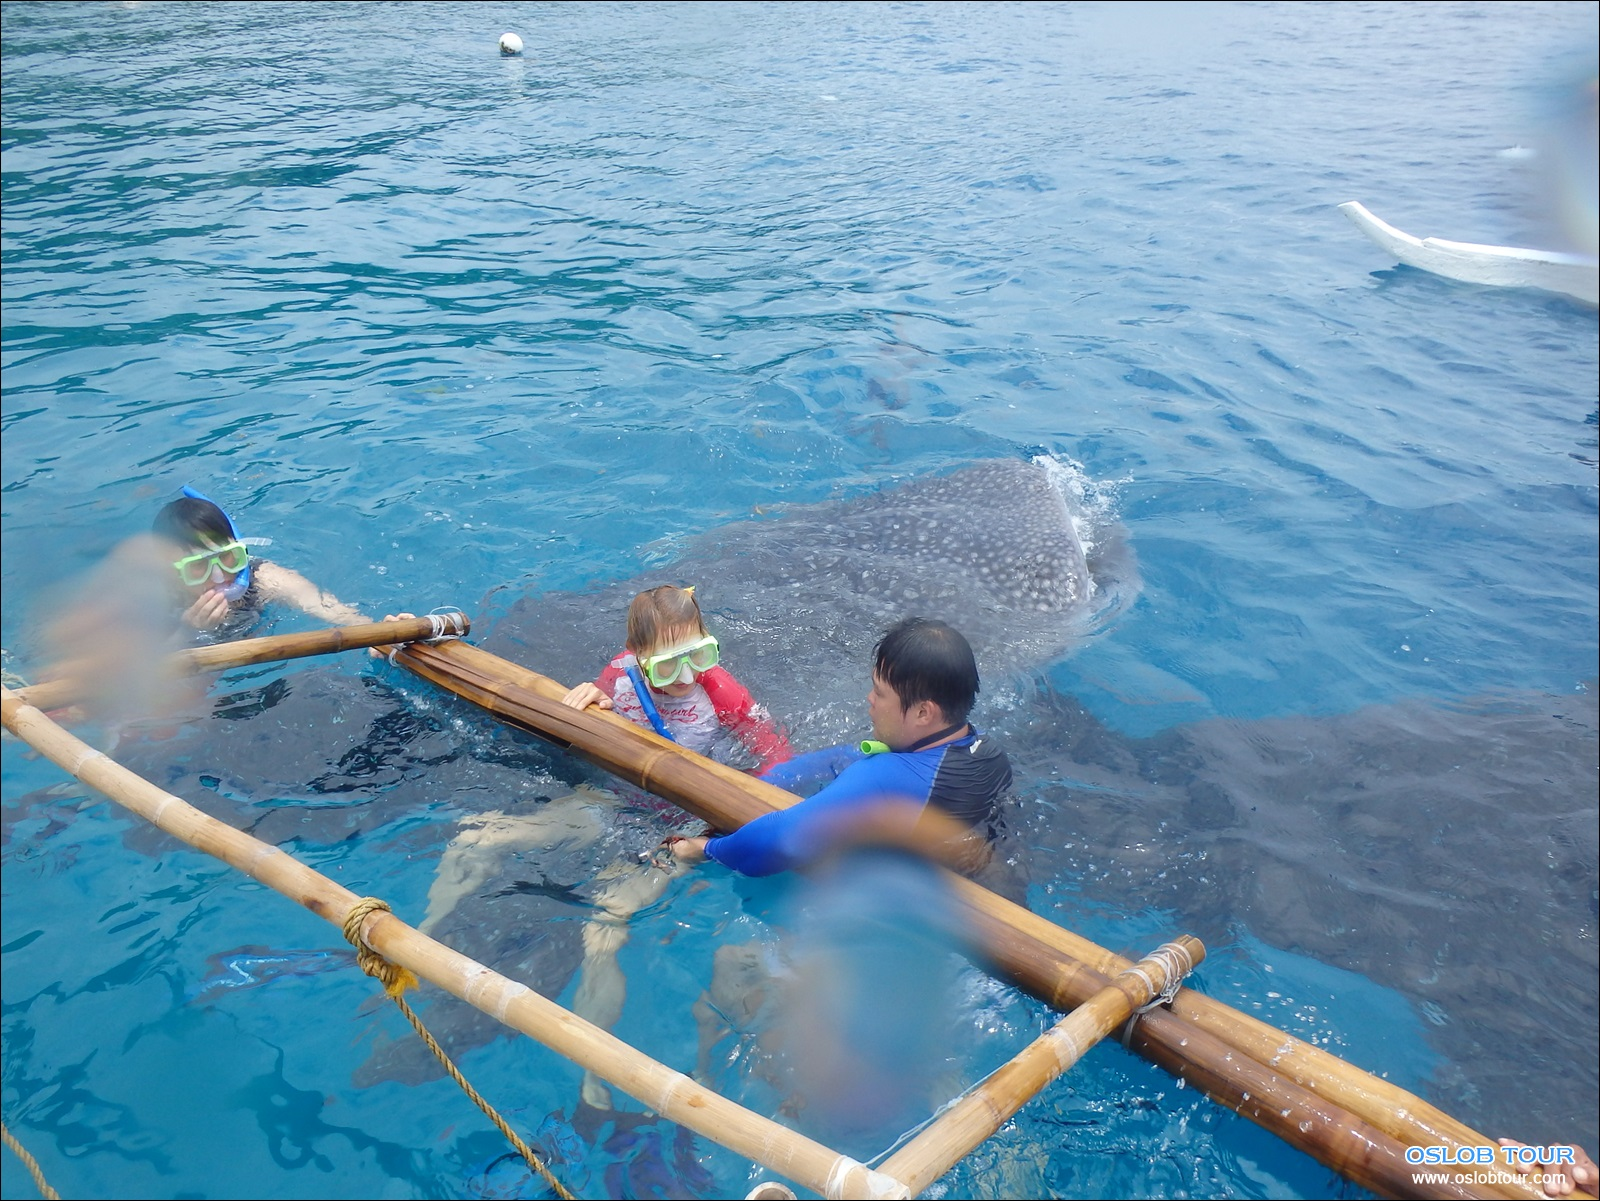 cebu oslob whale shark watching day tour 26 aug 2014 oslob tour